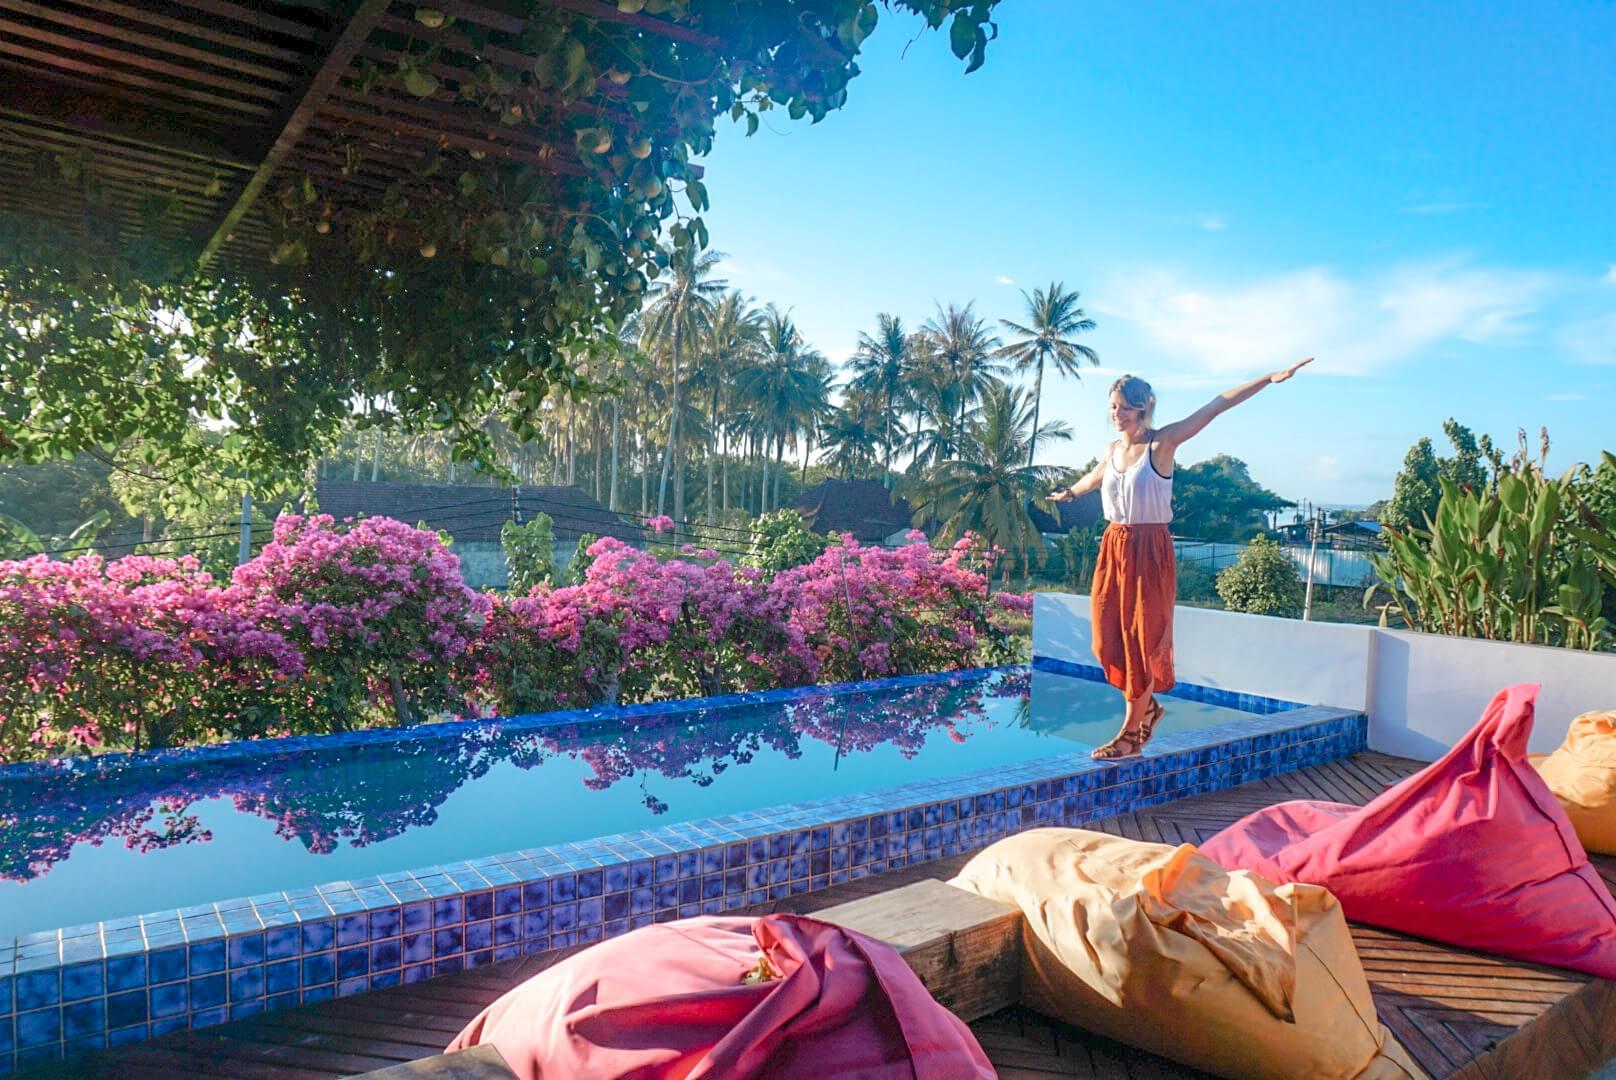 Hotel avec Piscine à Kuta Lombok Indonésie